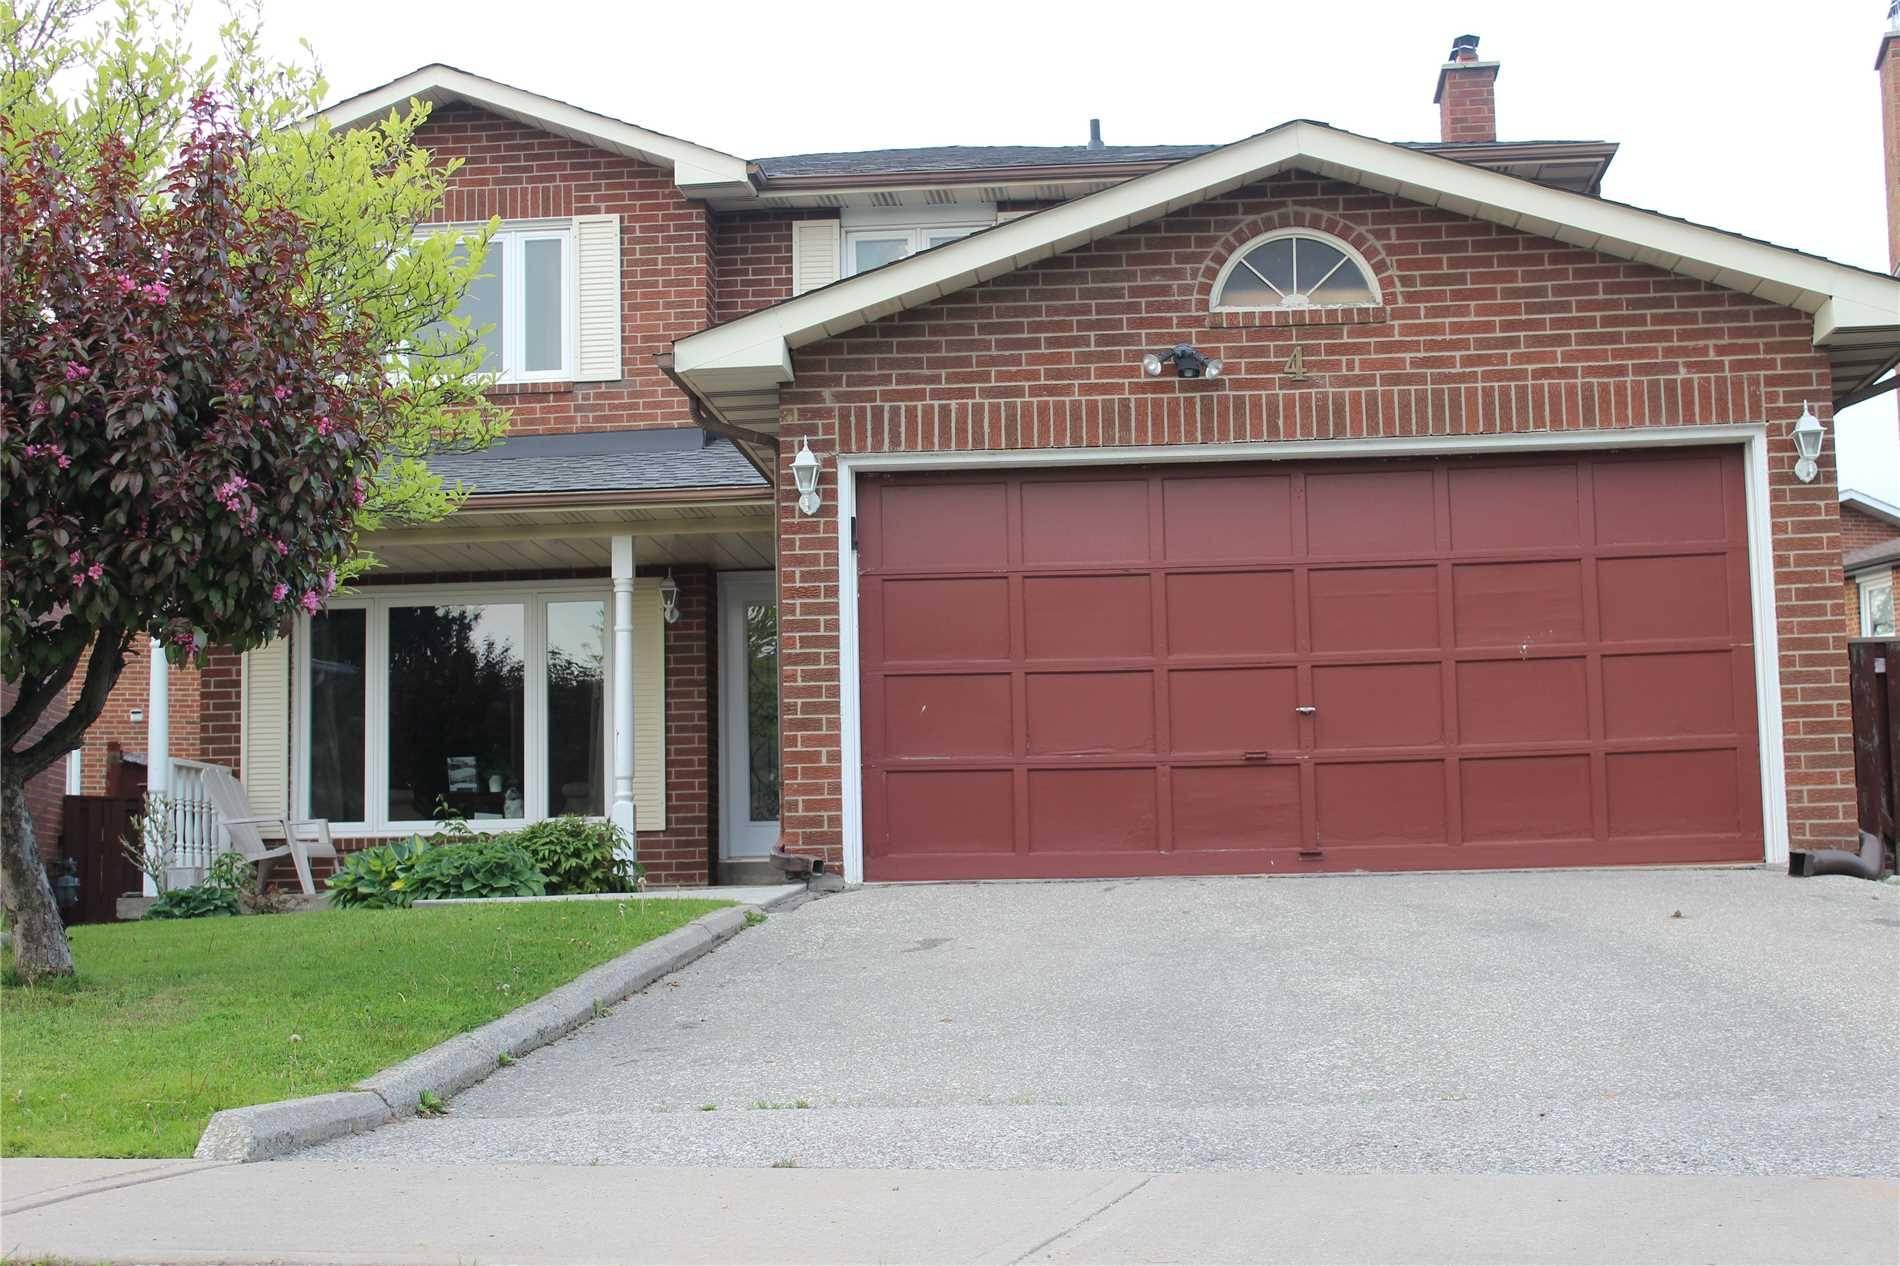 House for sale at 4 Quaker Ridge Rd Vaughan Ontario - MLS: N4452853